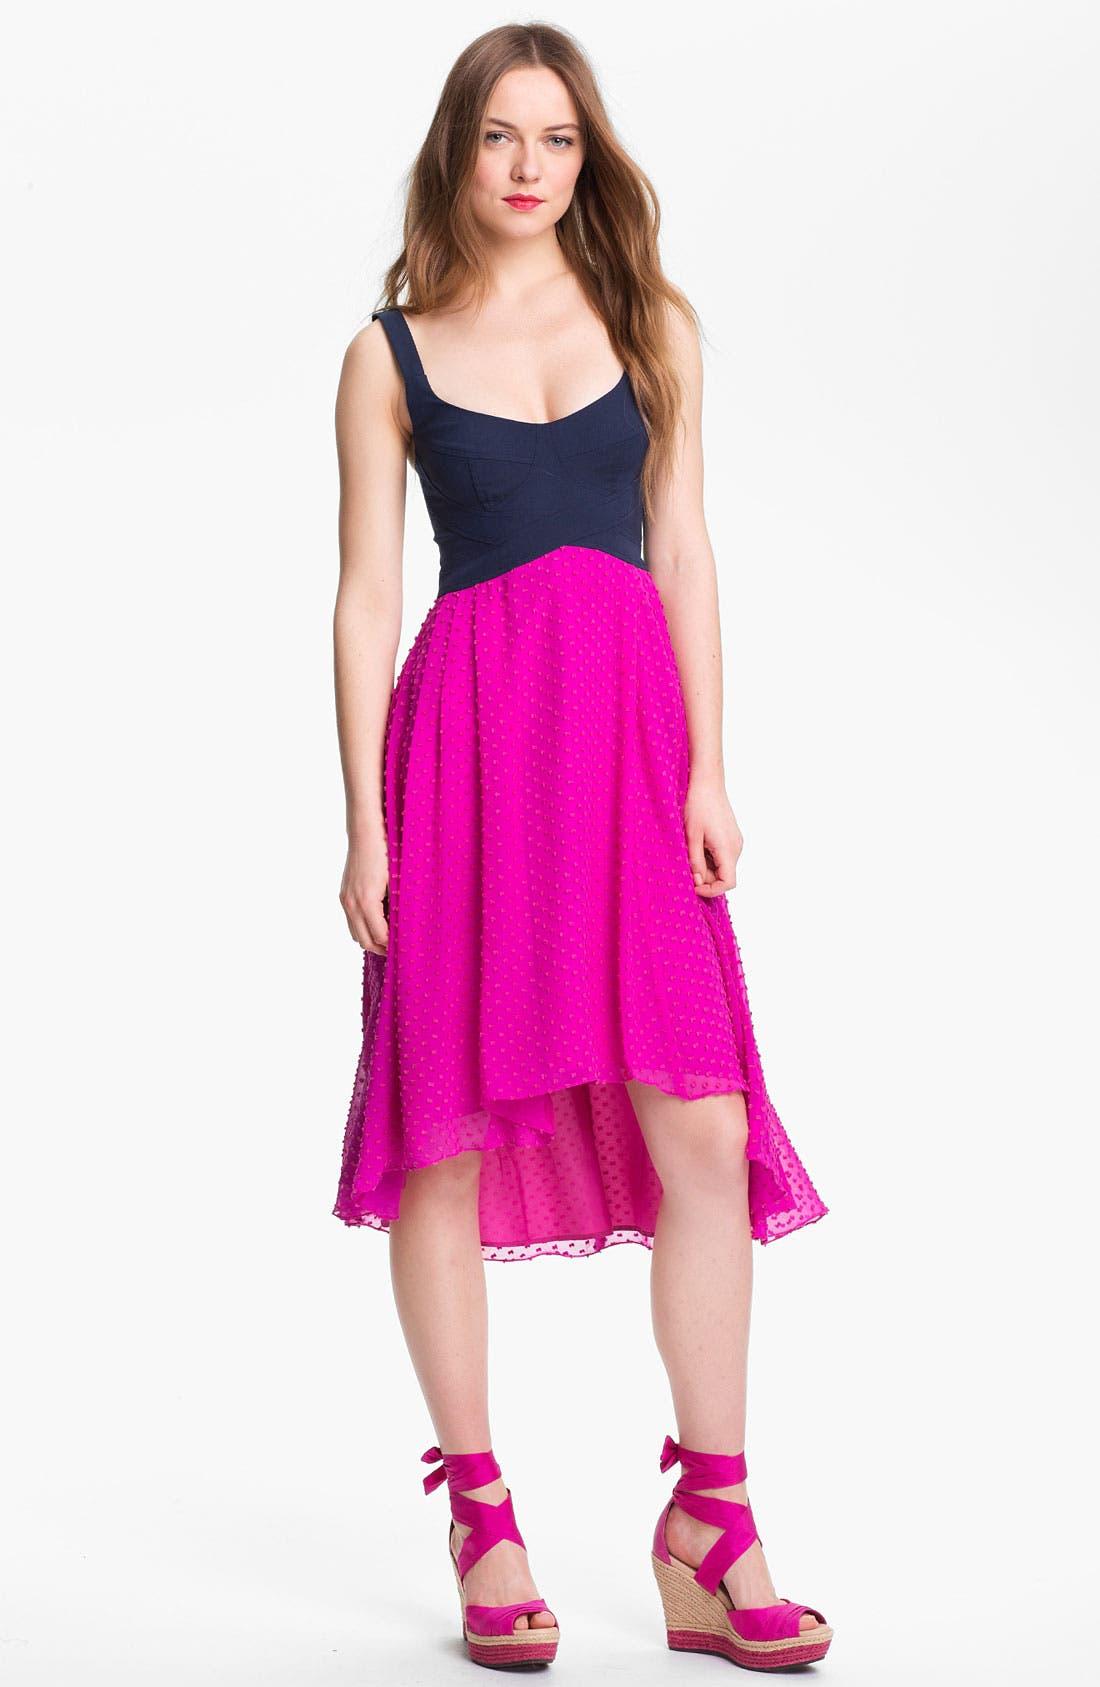 Main Image - Nanette Lepore 'Mermaid' Multi Media Fit & Flare Dress